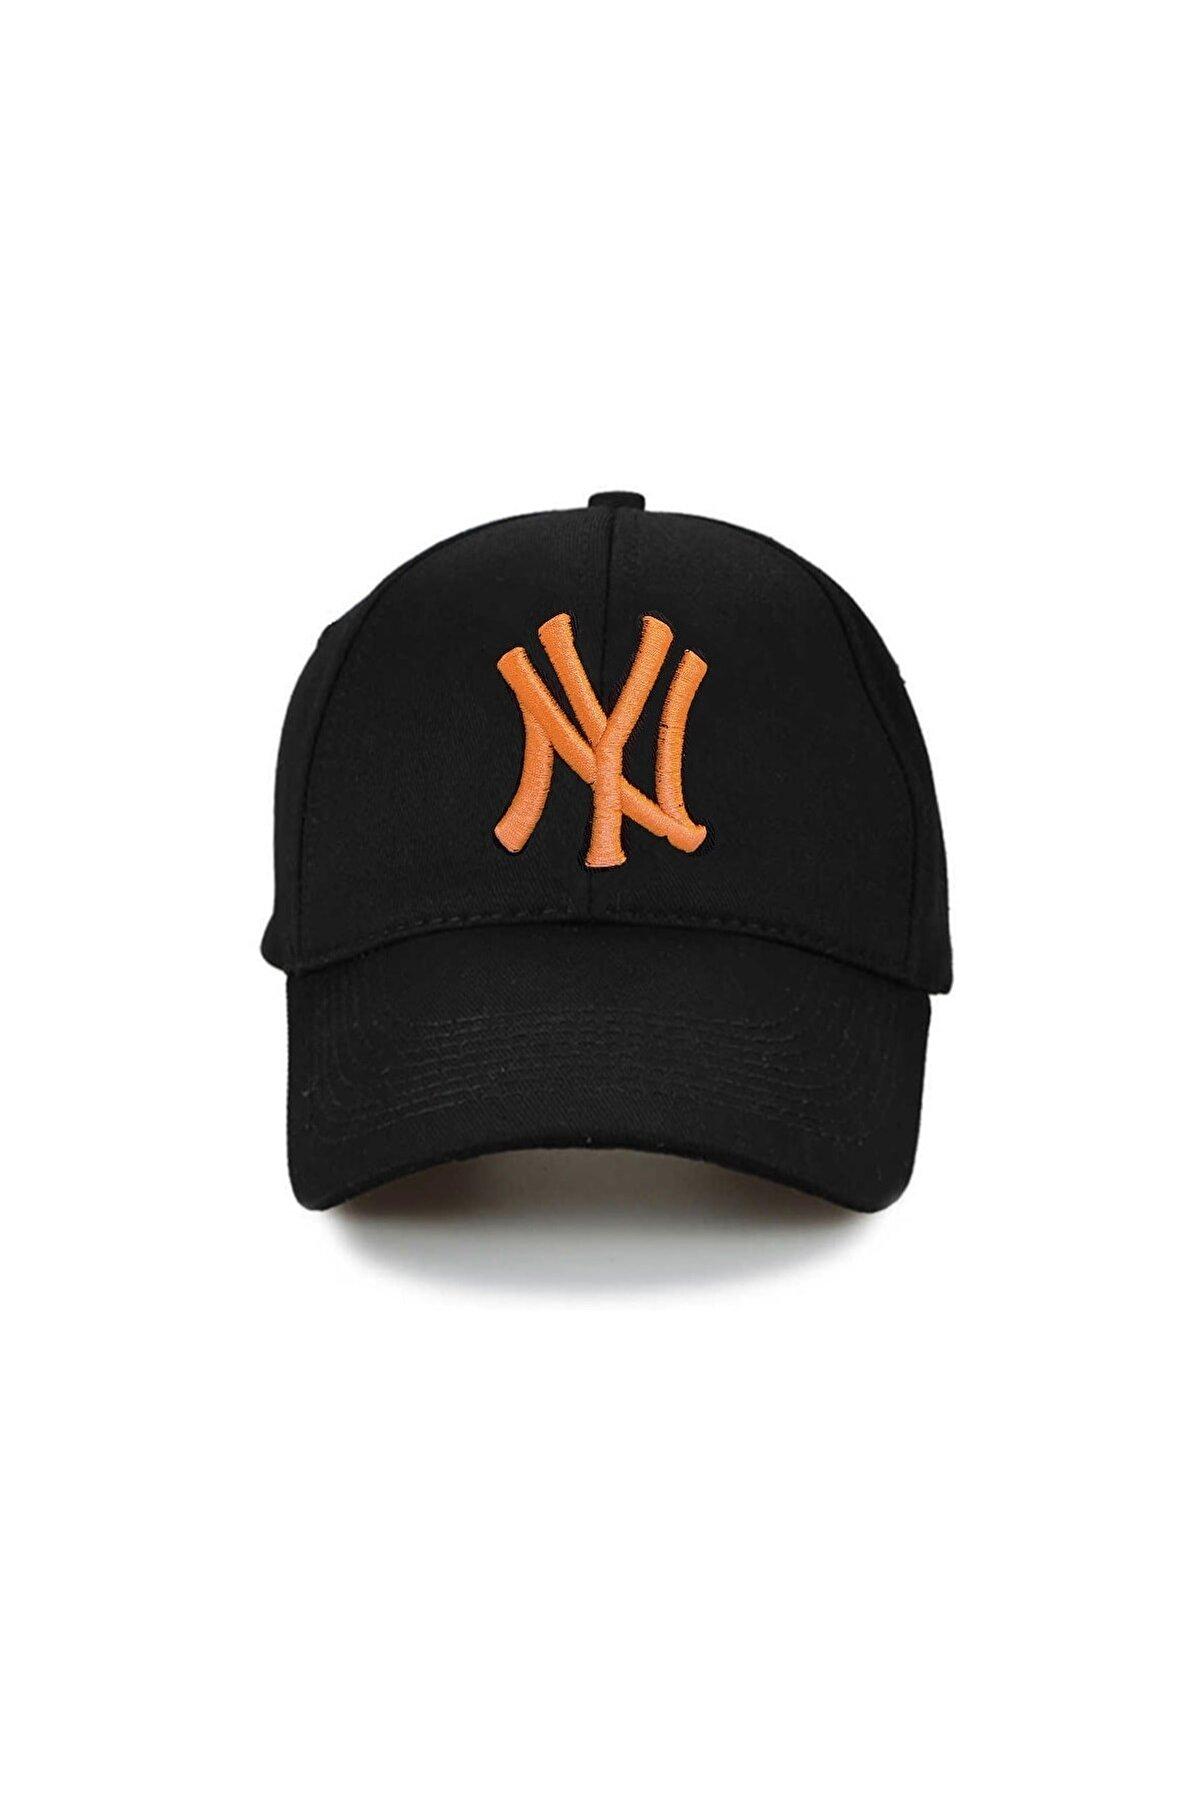 NuxFah Ny New York Unisex Siyah Şapka Özel Oranj Nakış